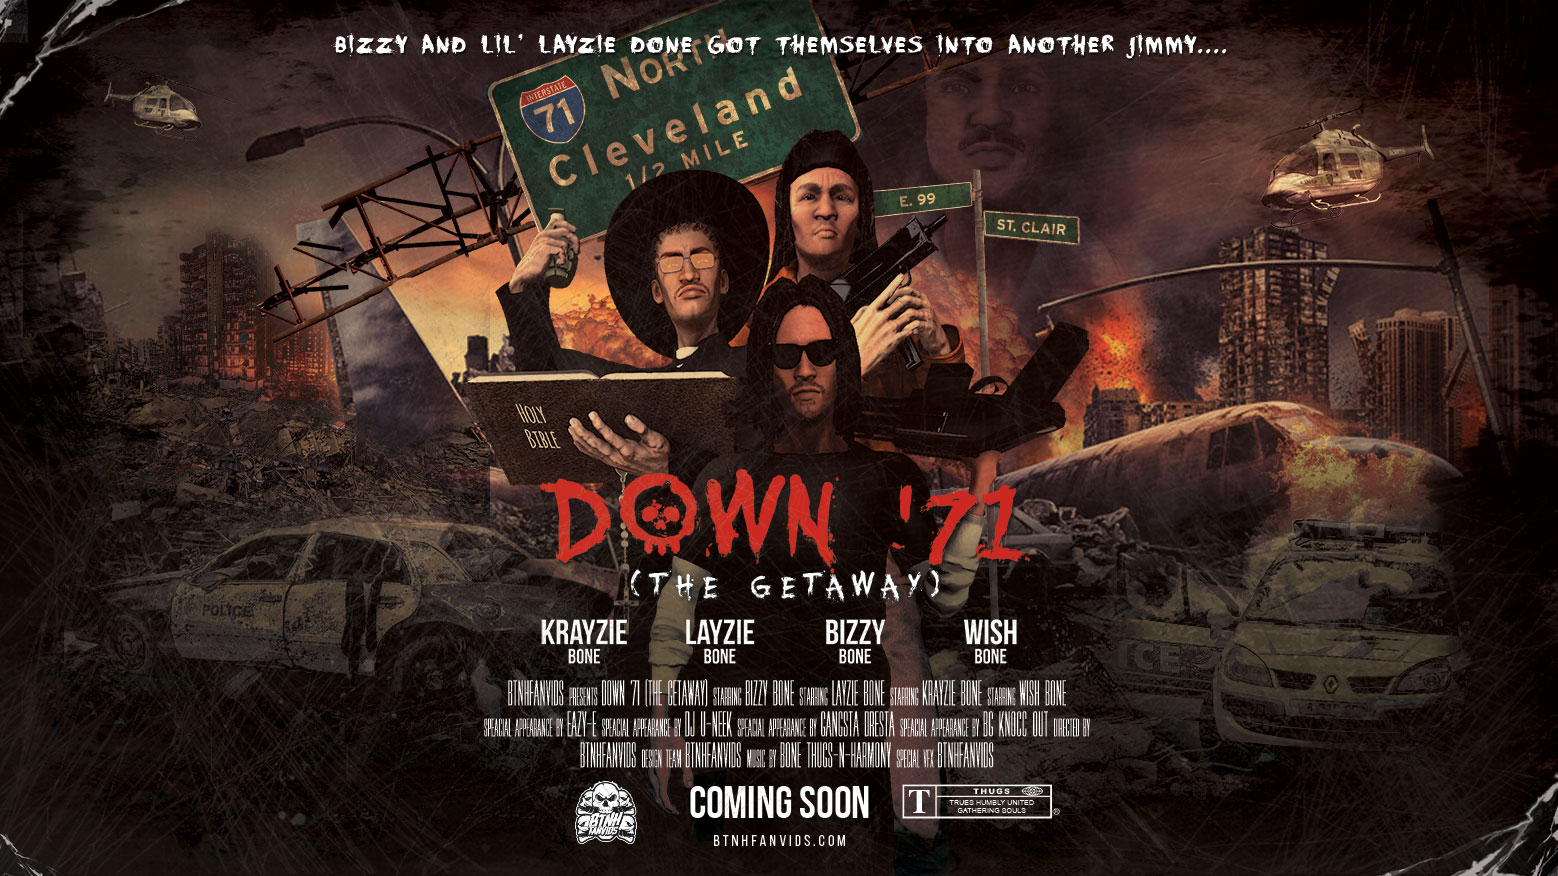 BTNHFanvids Down '71 (The Getaway) Poster